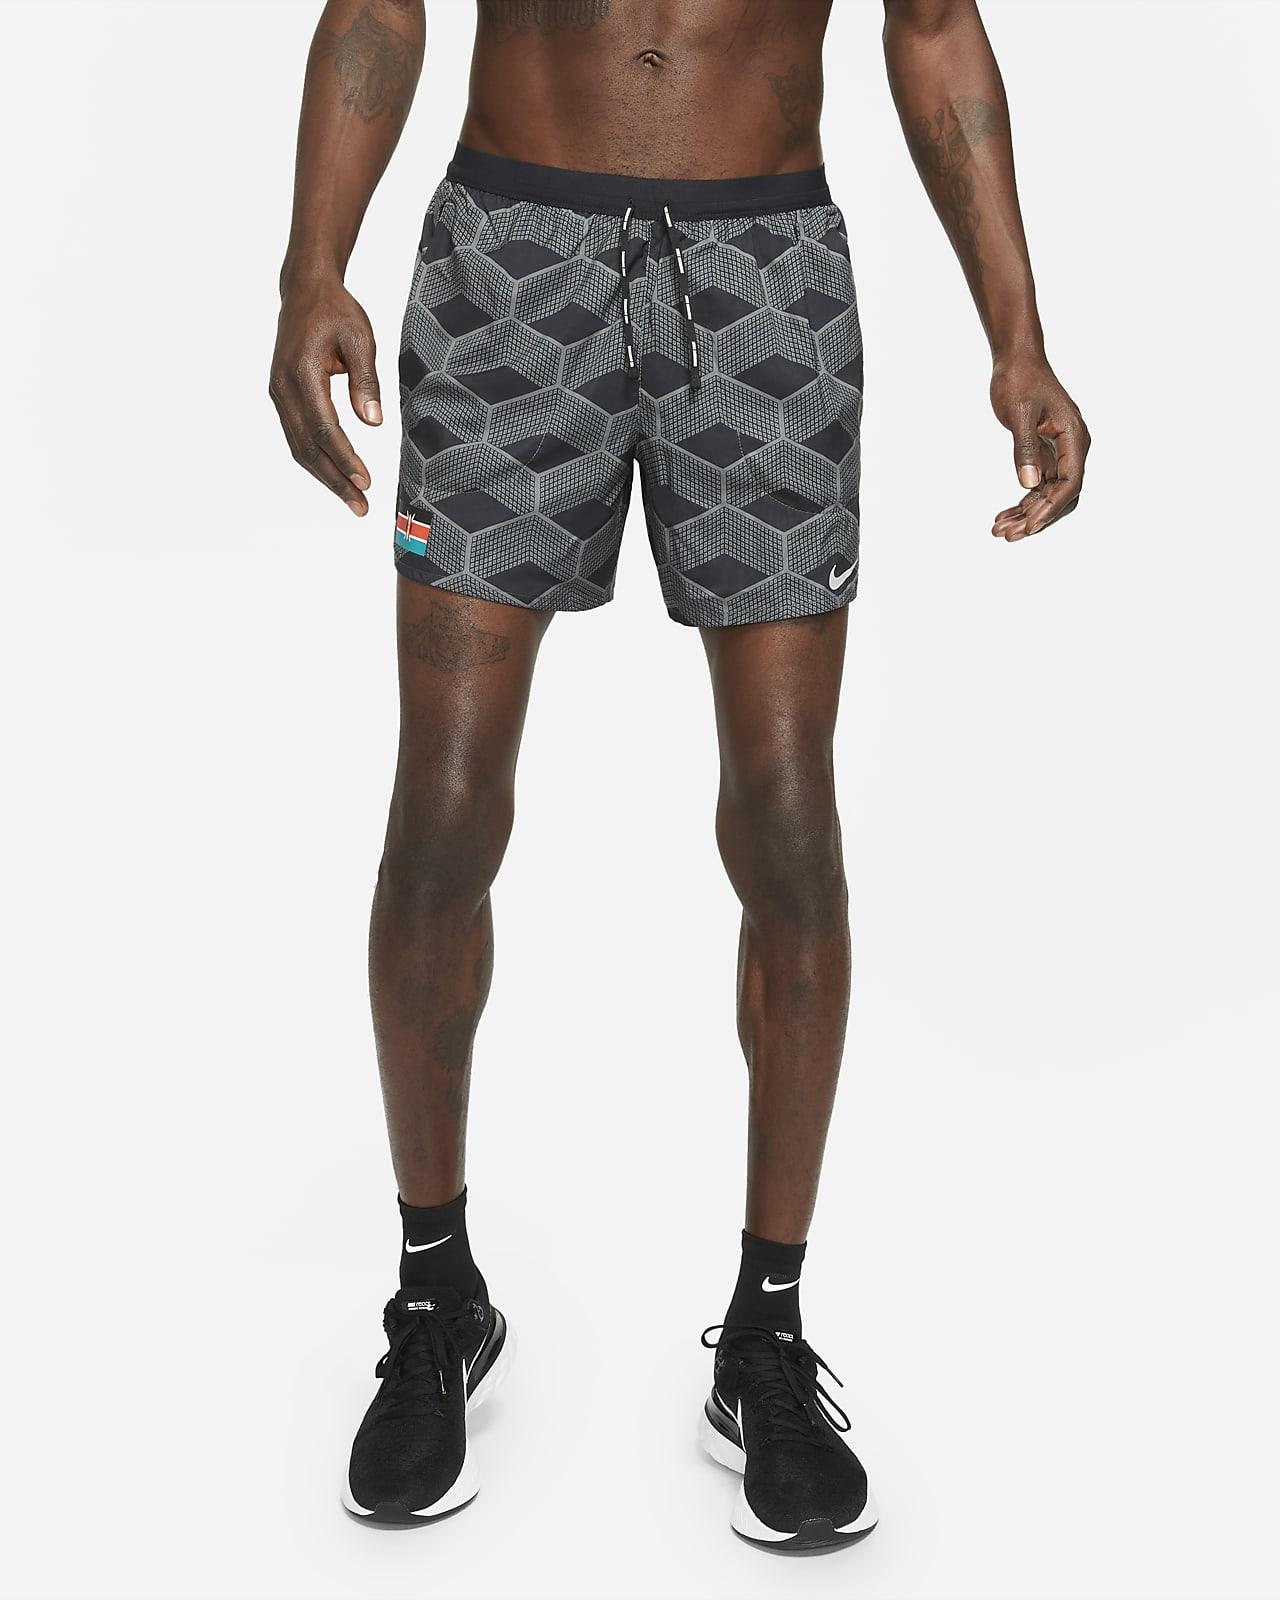 Short de running Nike Dri-FIT Team Kenya Flex Stride pour Homme